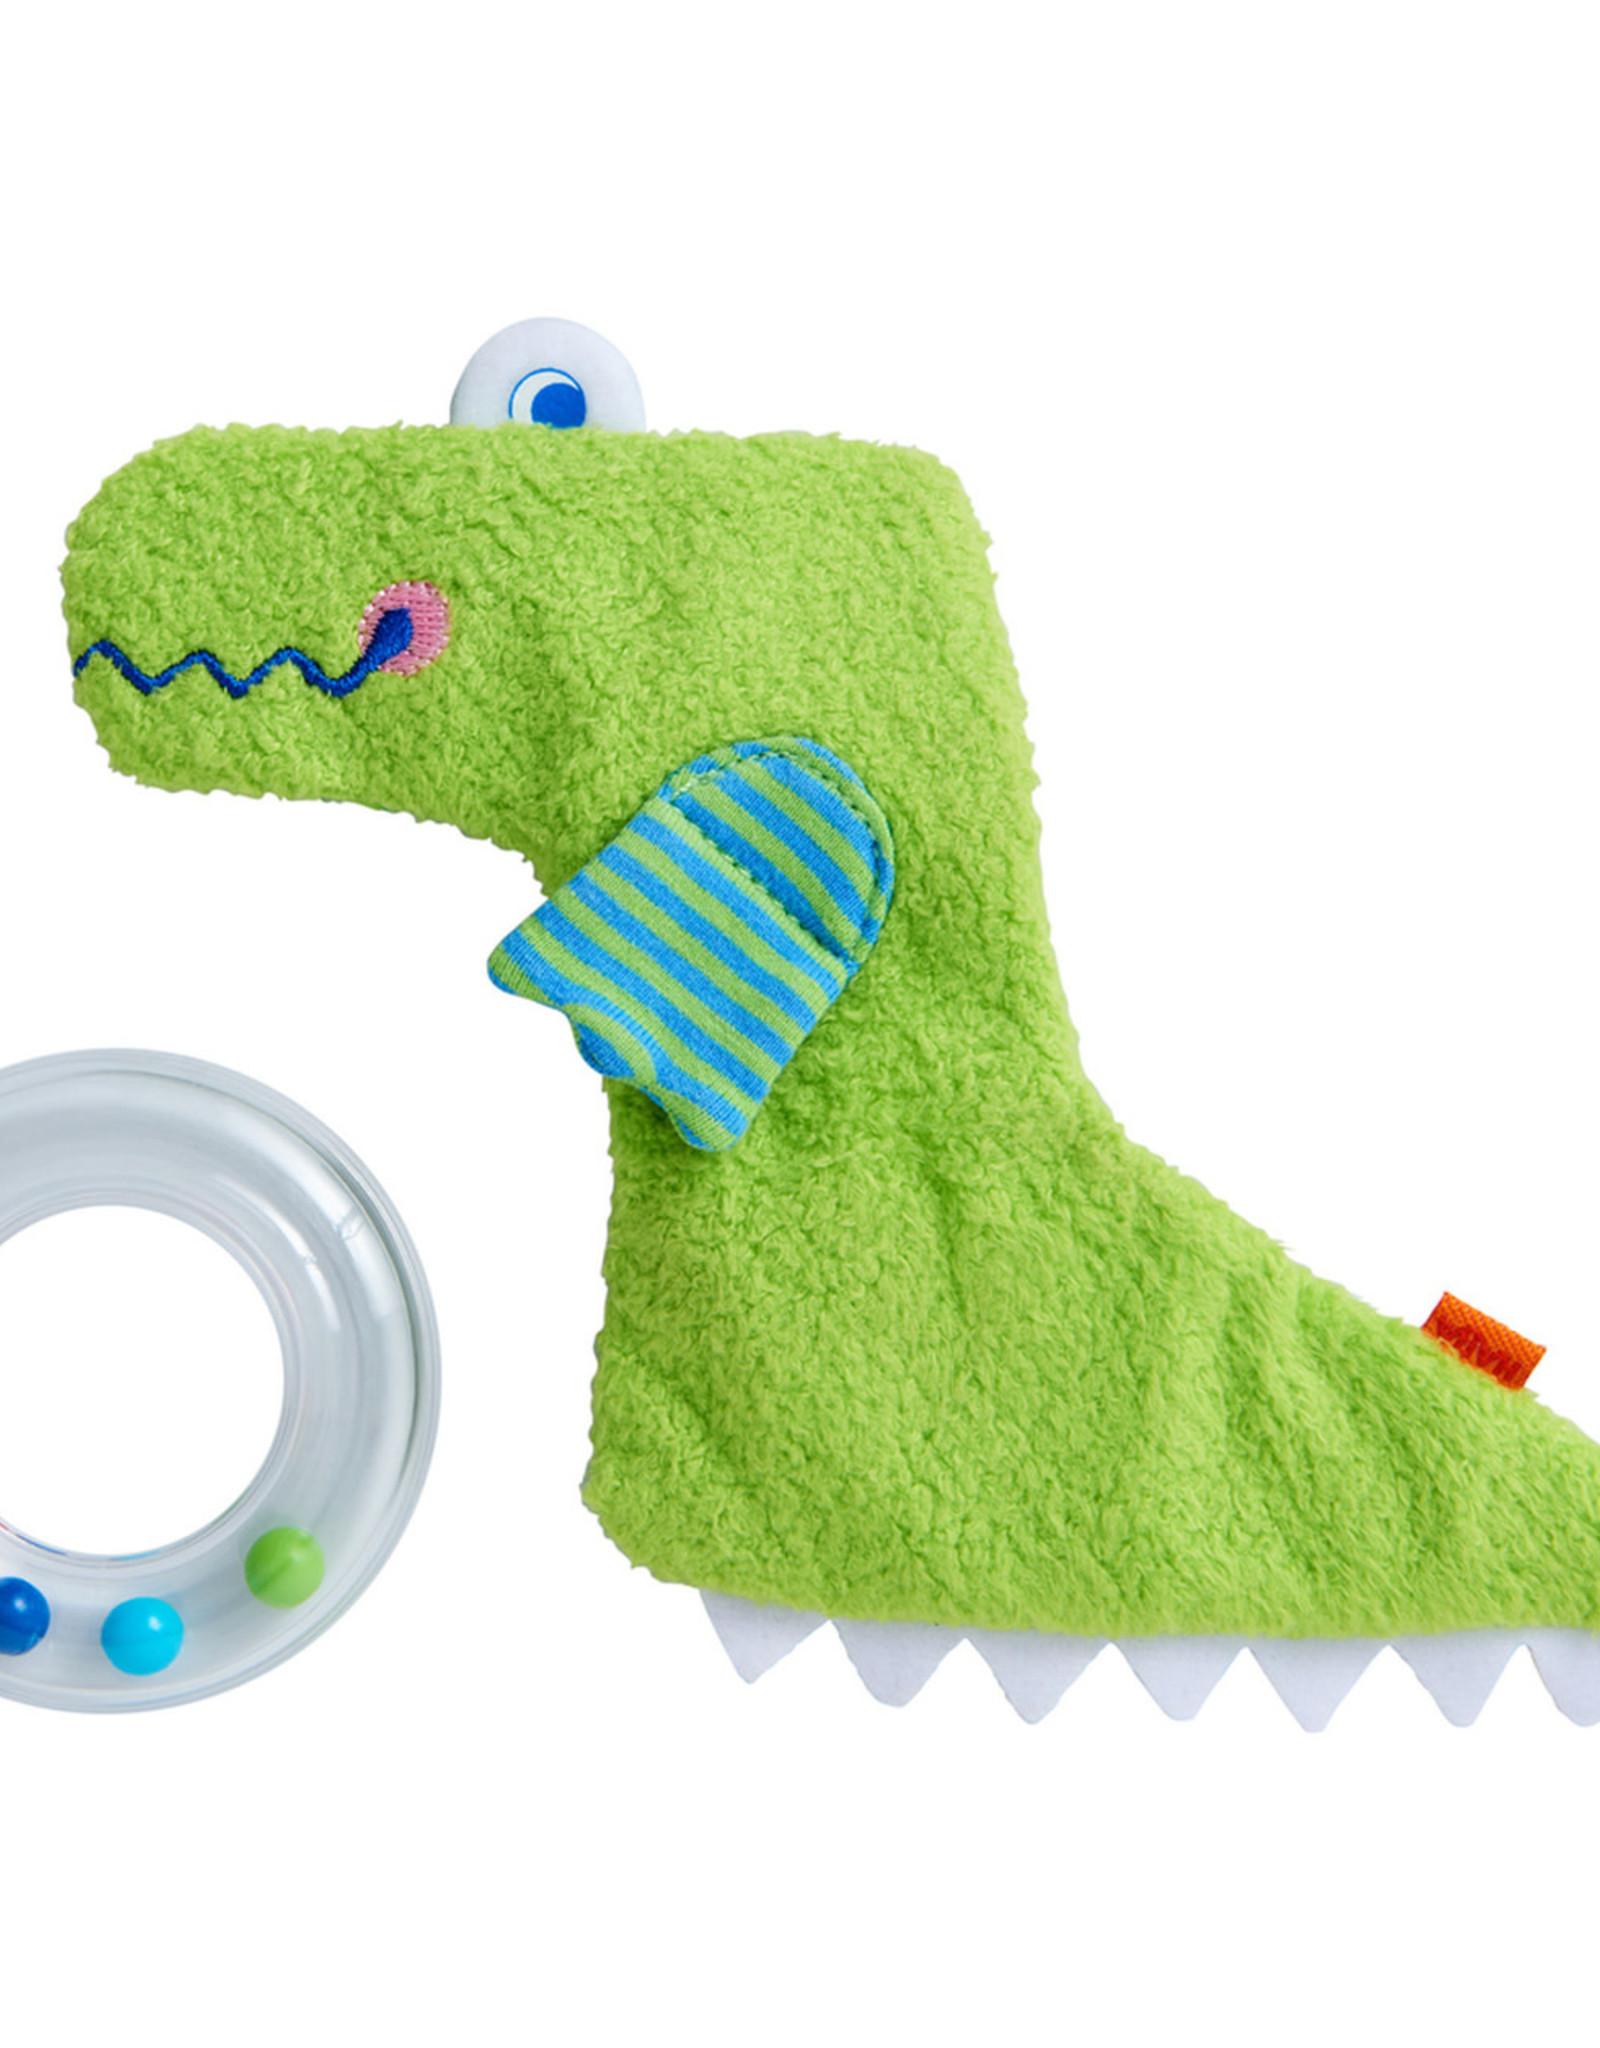 Haba Clutching Toy Crocodile w/ Ring